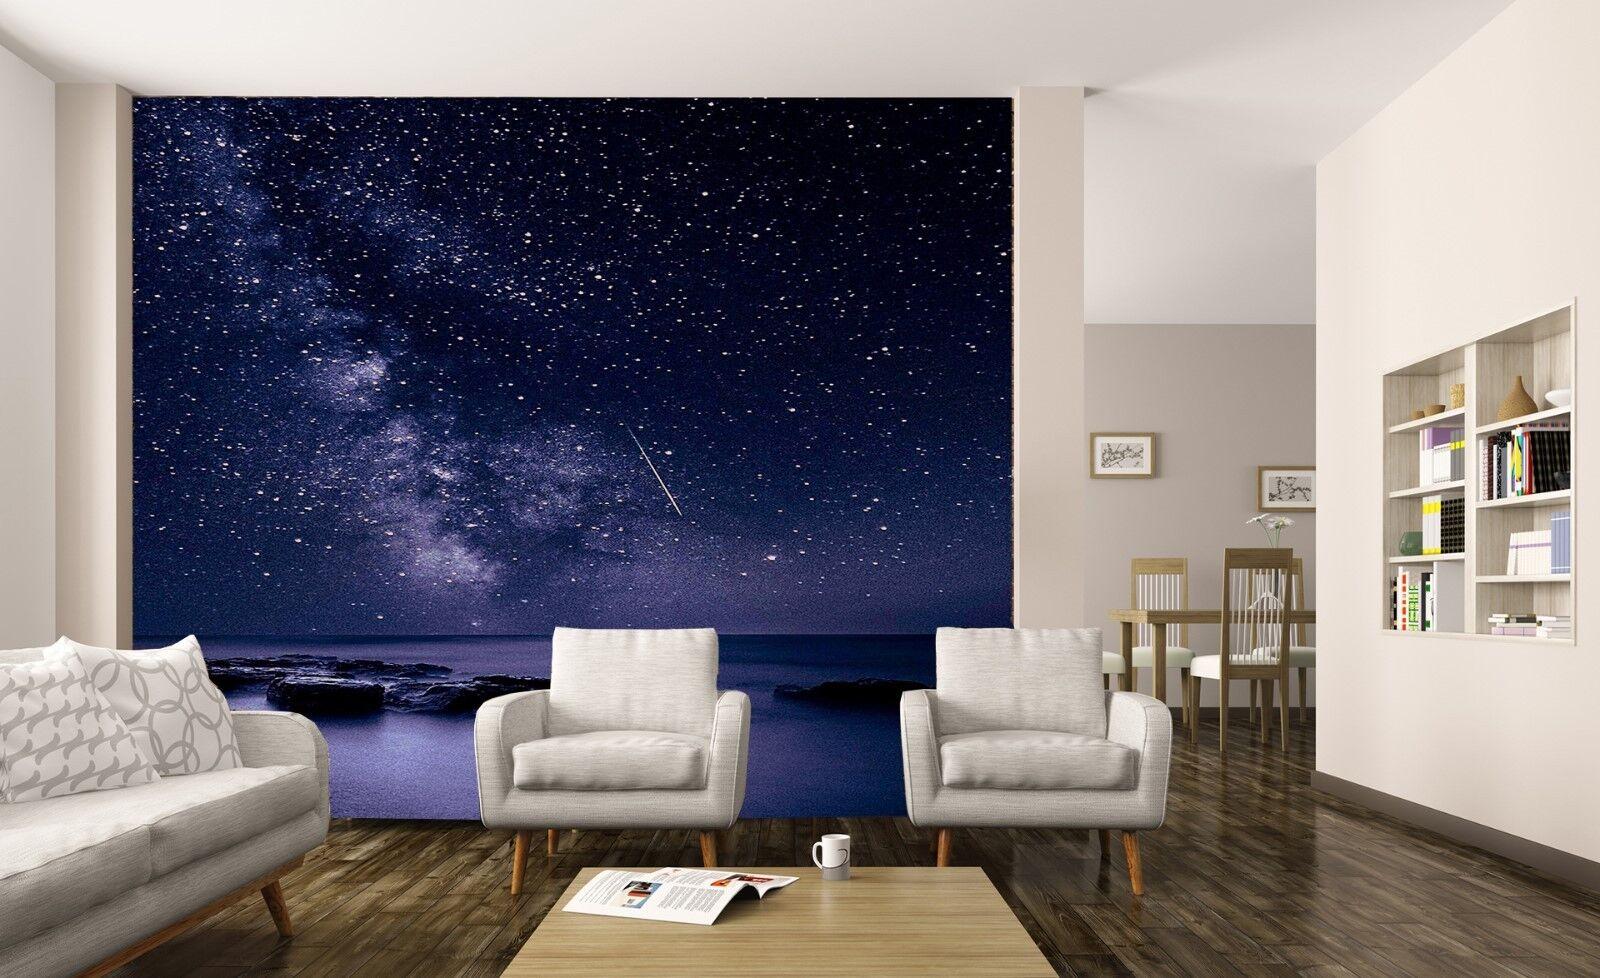 Space Galaxy Stars Planets Night Sky Wallpaper Mural Shooting Star Photo Poster Ebay